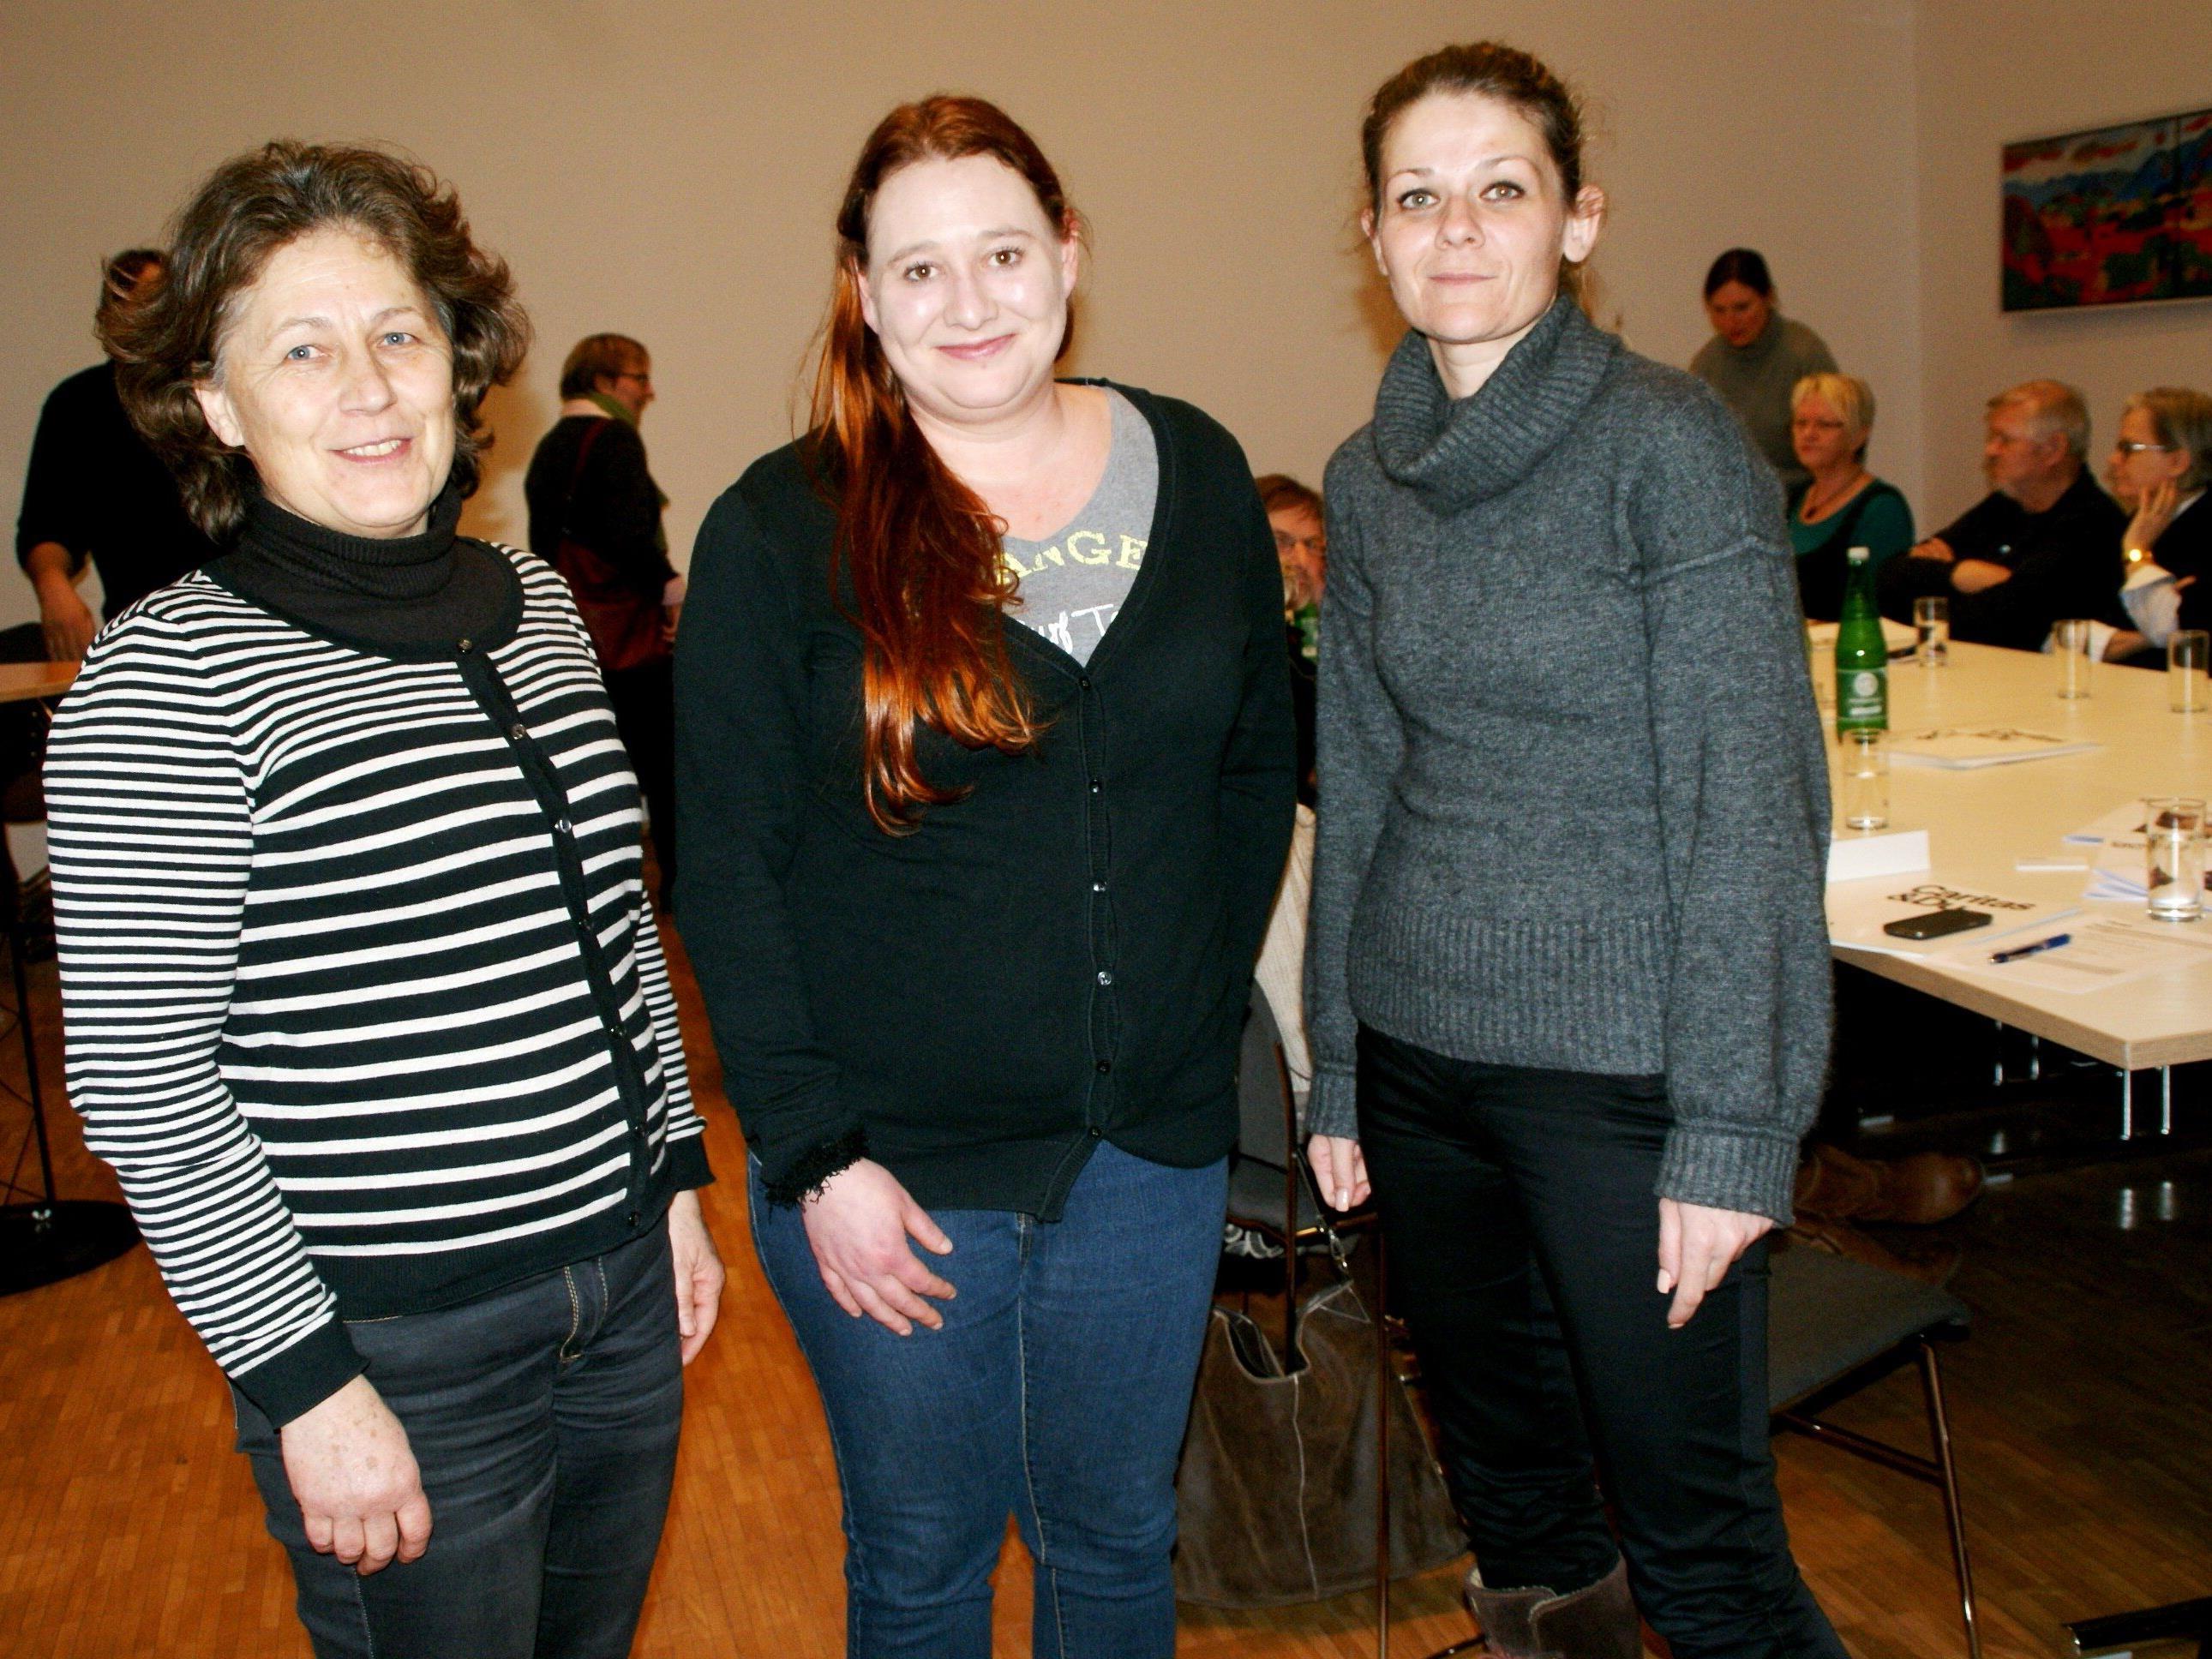 v.li. Elisabeth Meusburger, Claudia Wohlgenannt, Denka Mujkanovic-Subasic